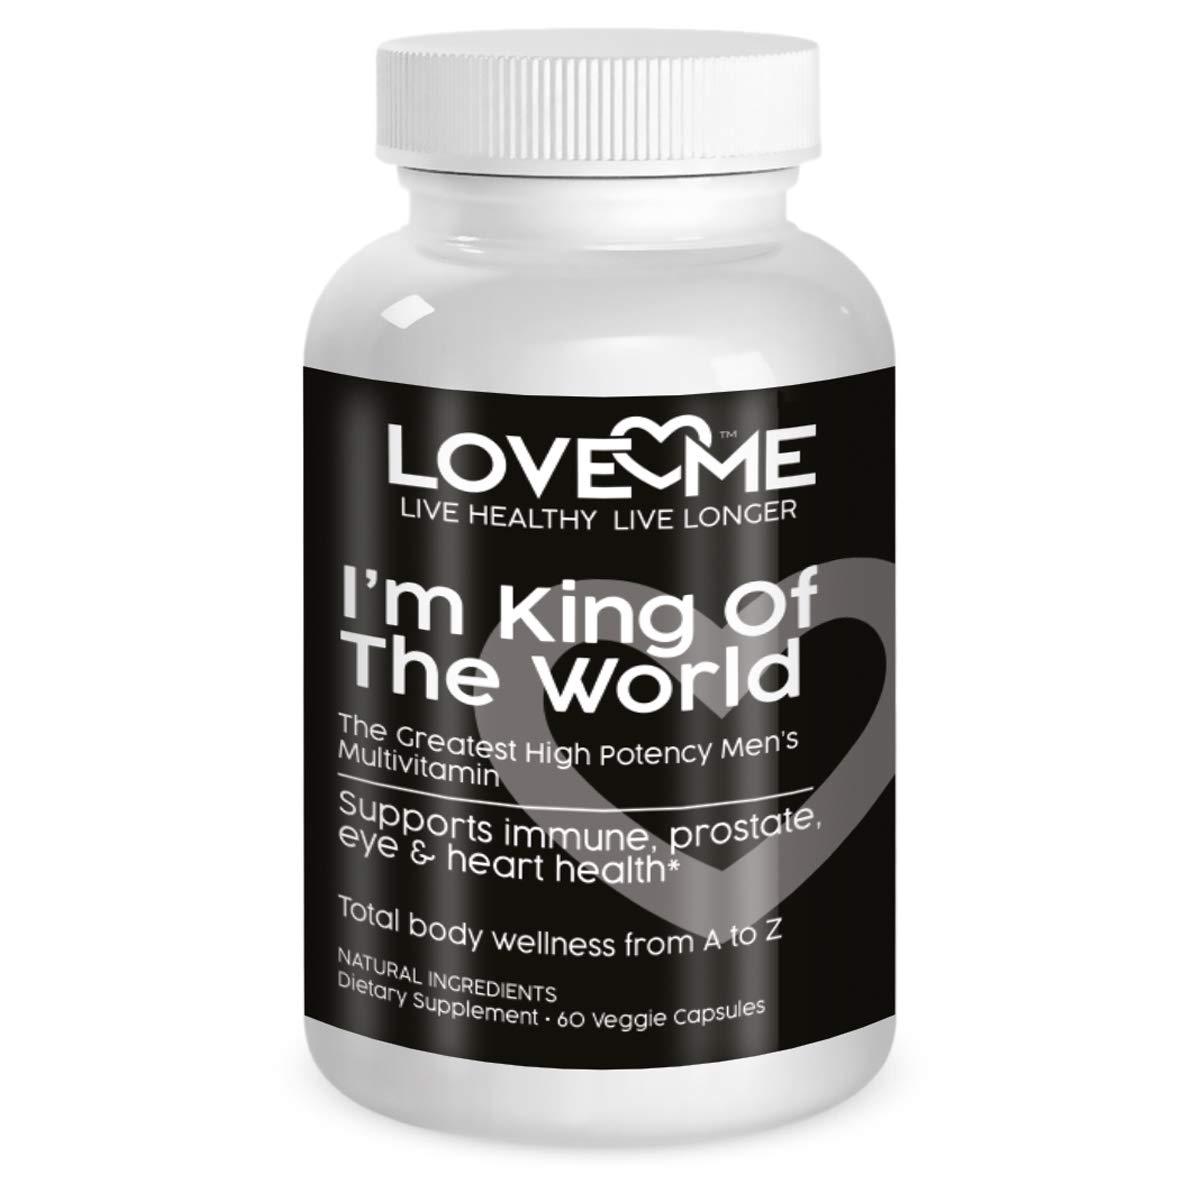 Love Me Nutrition – I m King of The World – Men s Multi B1, B2, B3, B5, B6, B12, Male Support, Blood Pressure Control- Herbs, Antioxidants. Natural No Artificial Ingredient. 60 Vegi Caps